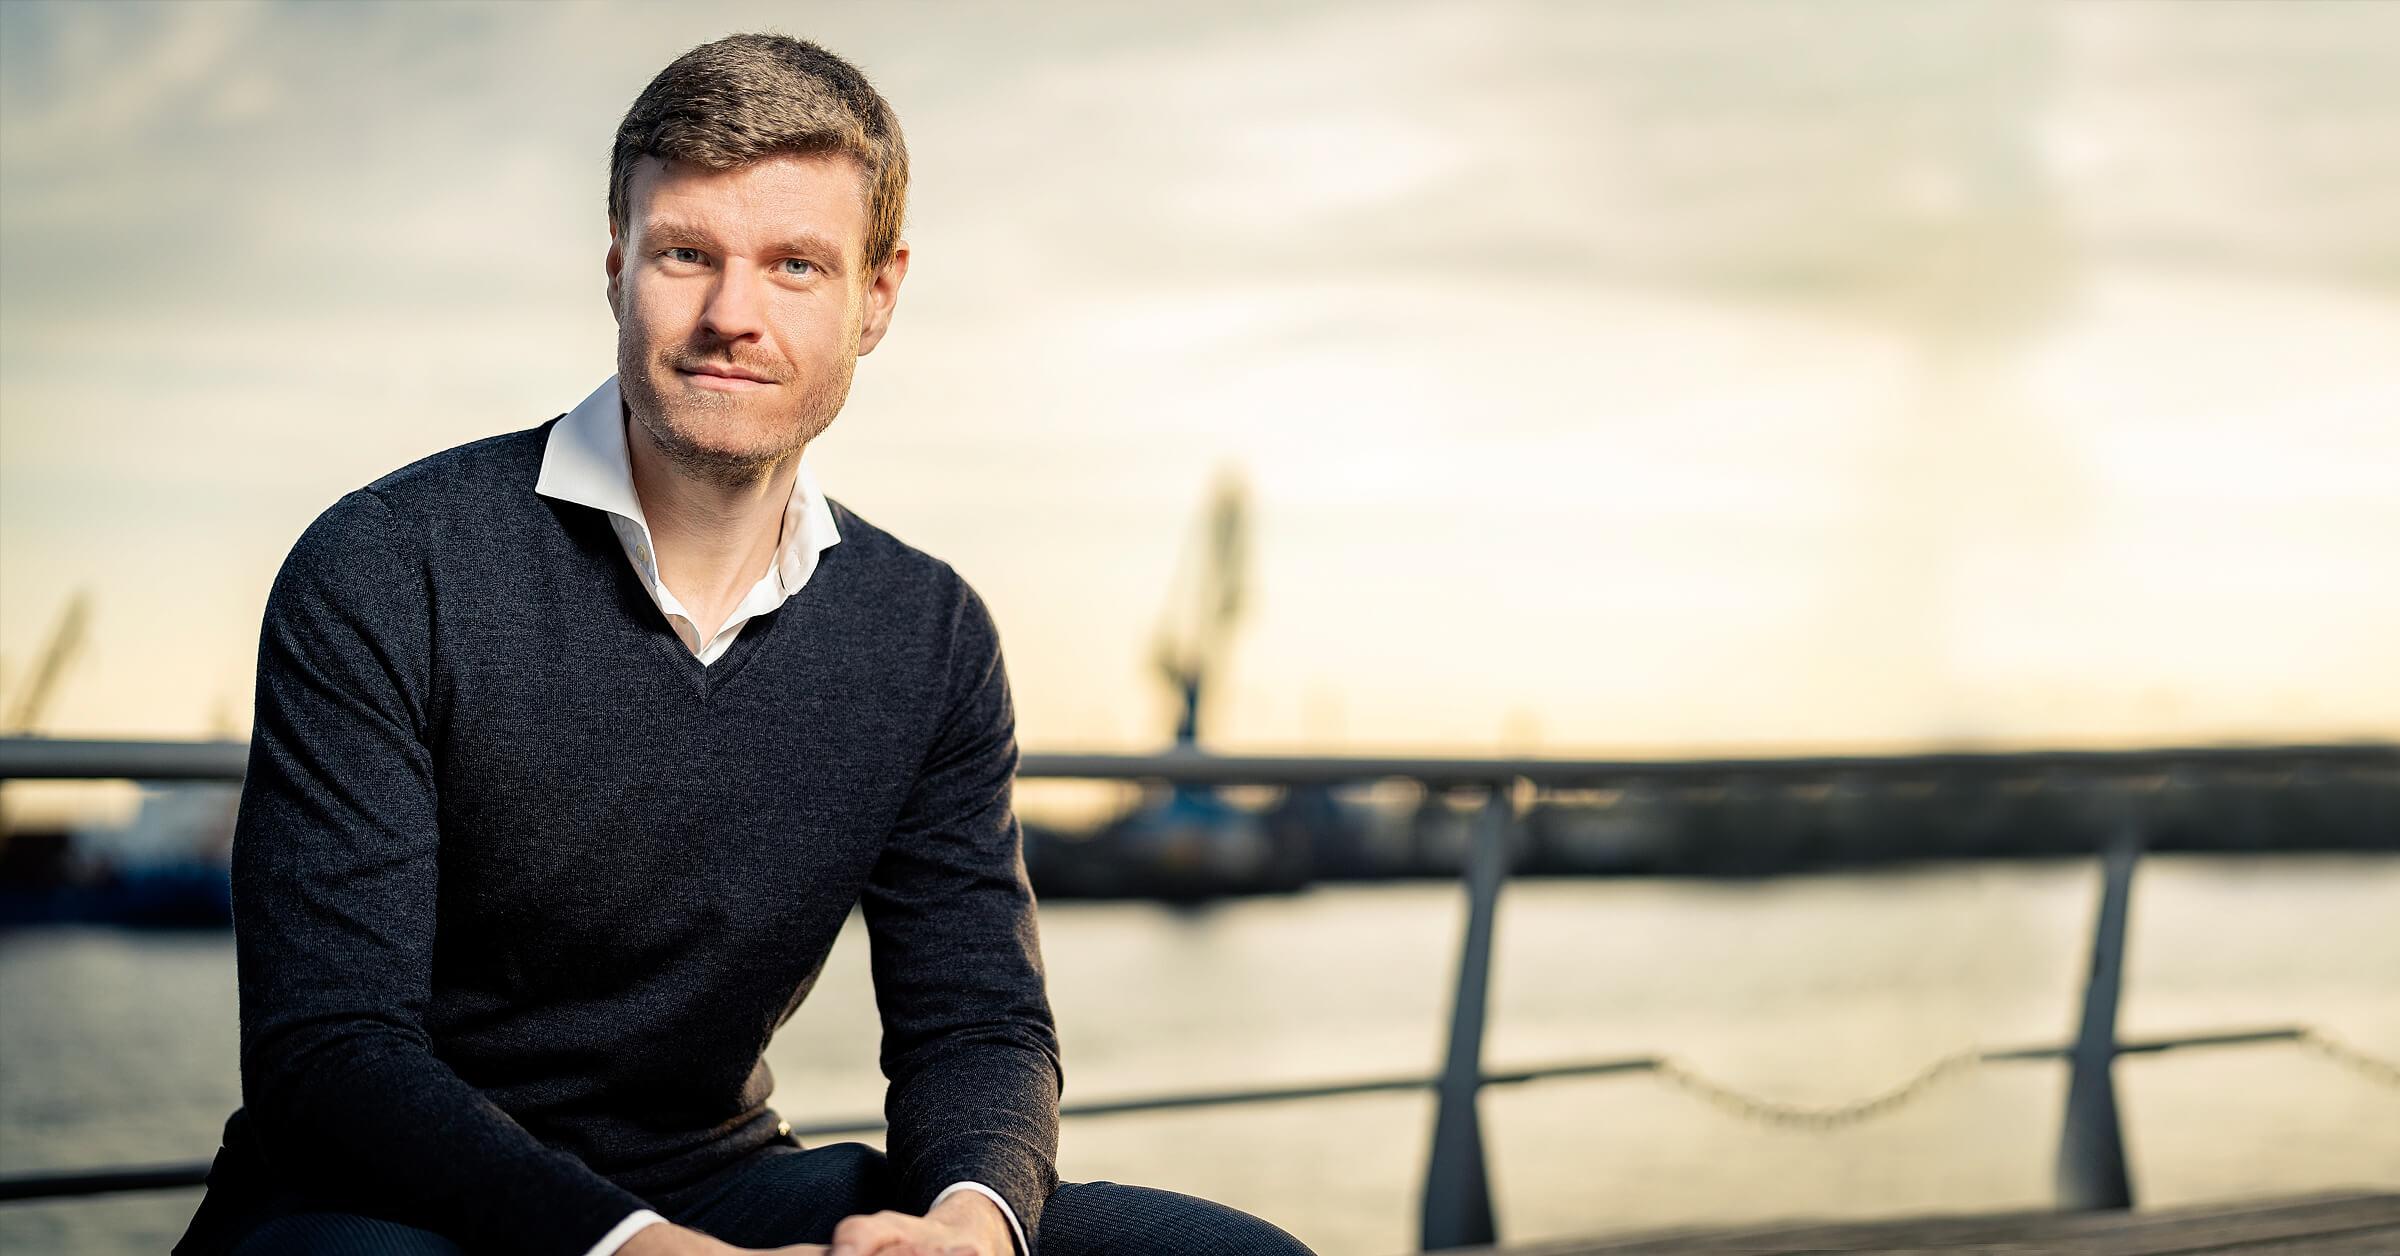 Oliver Sparing - Aktienhandel - Trading - Daytrading lernen